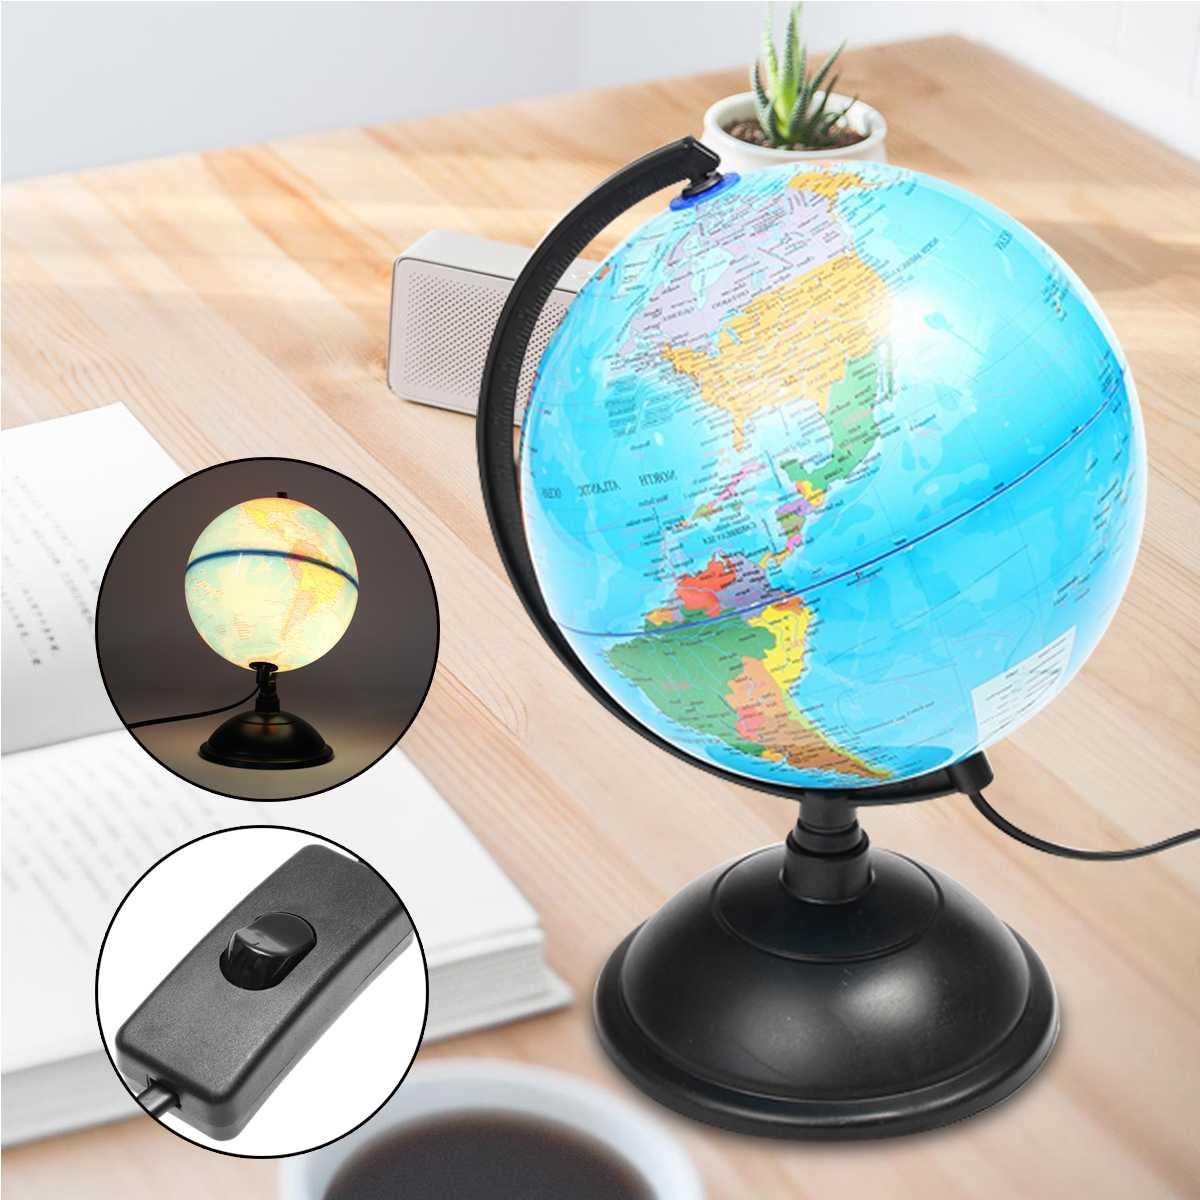 20cm Electric LED Light World Globe Earth Map Teach Education Geography Toy Terrestrial Tellurion Globe Home Office Desk Decor